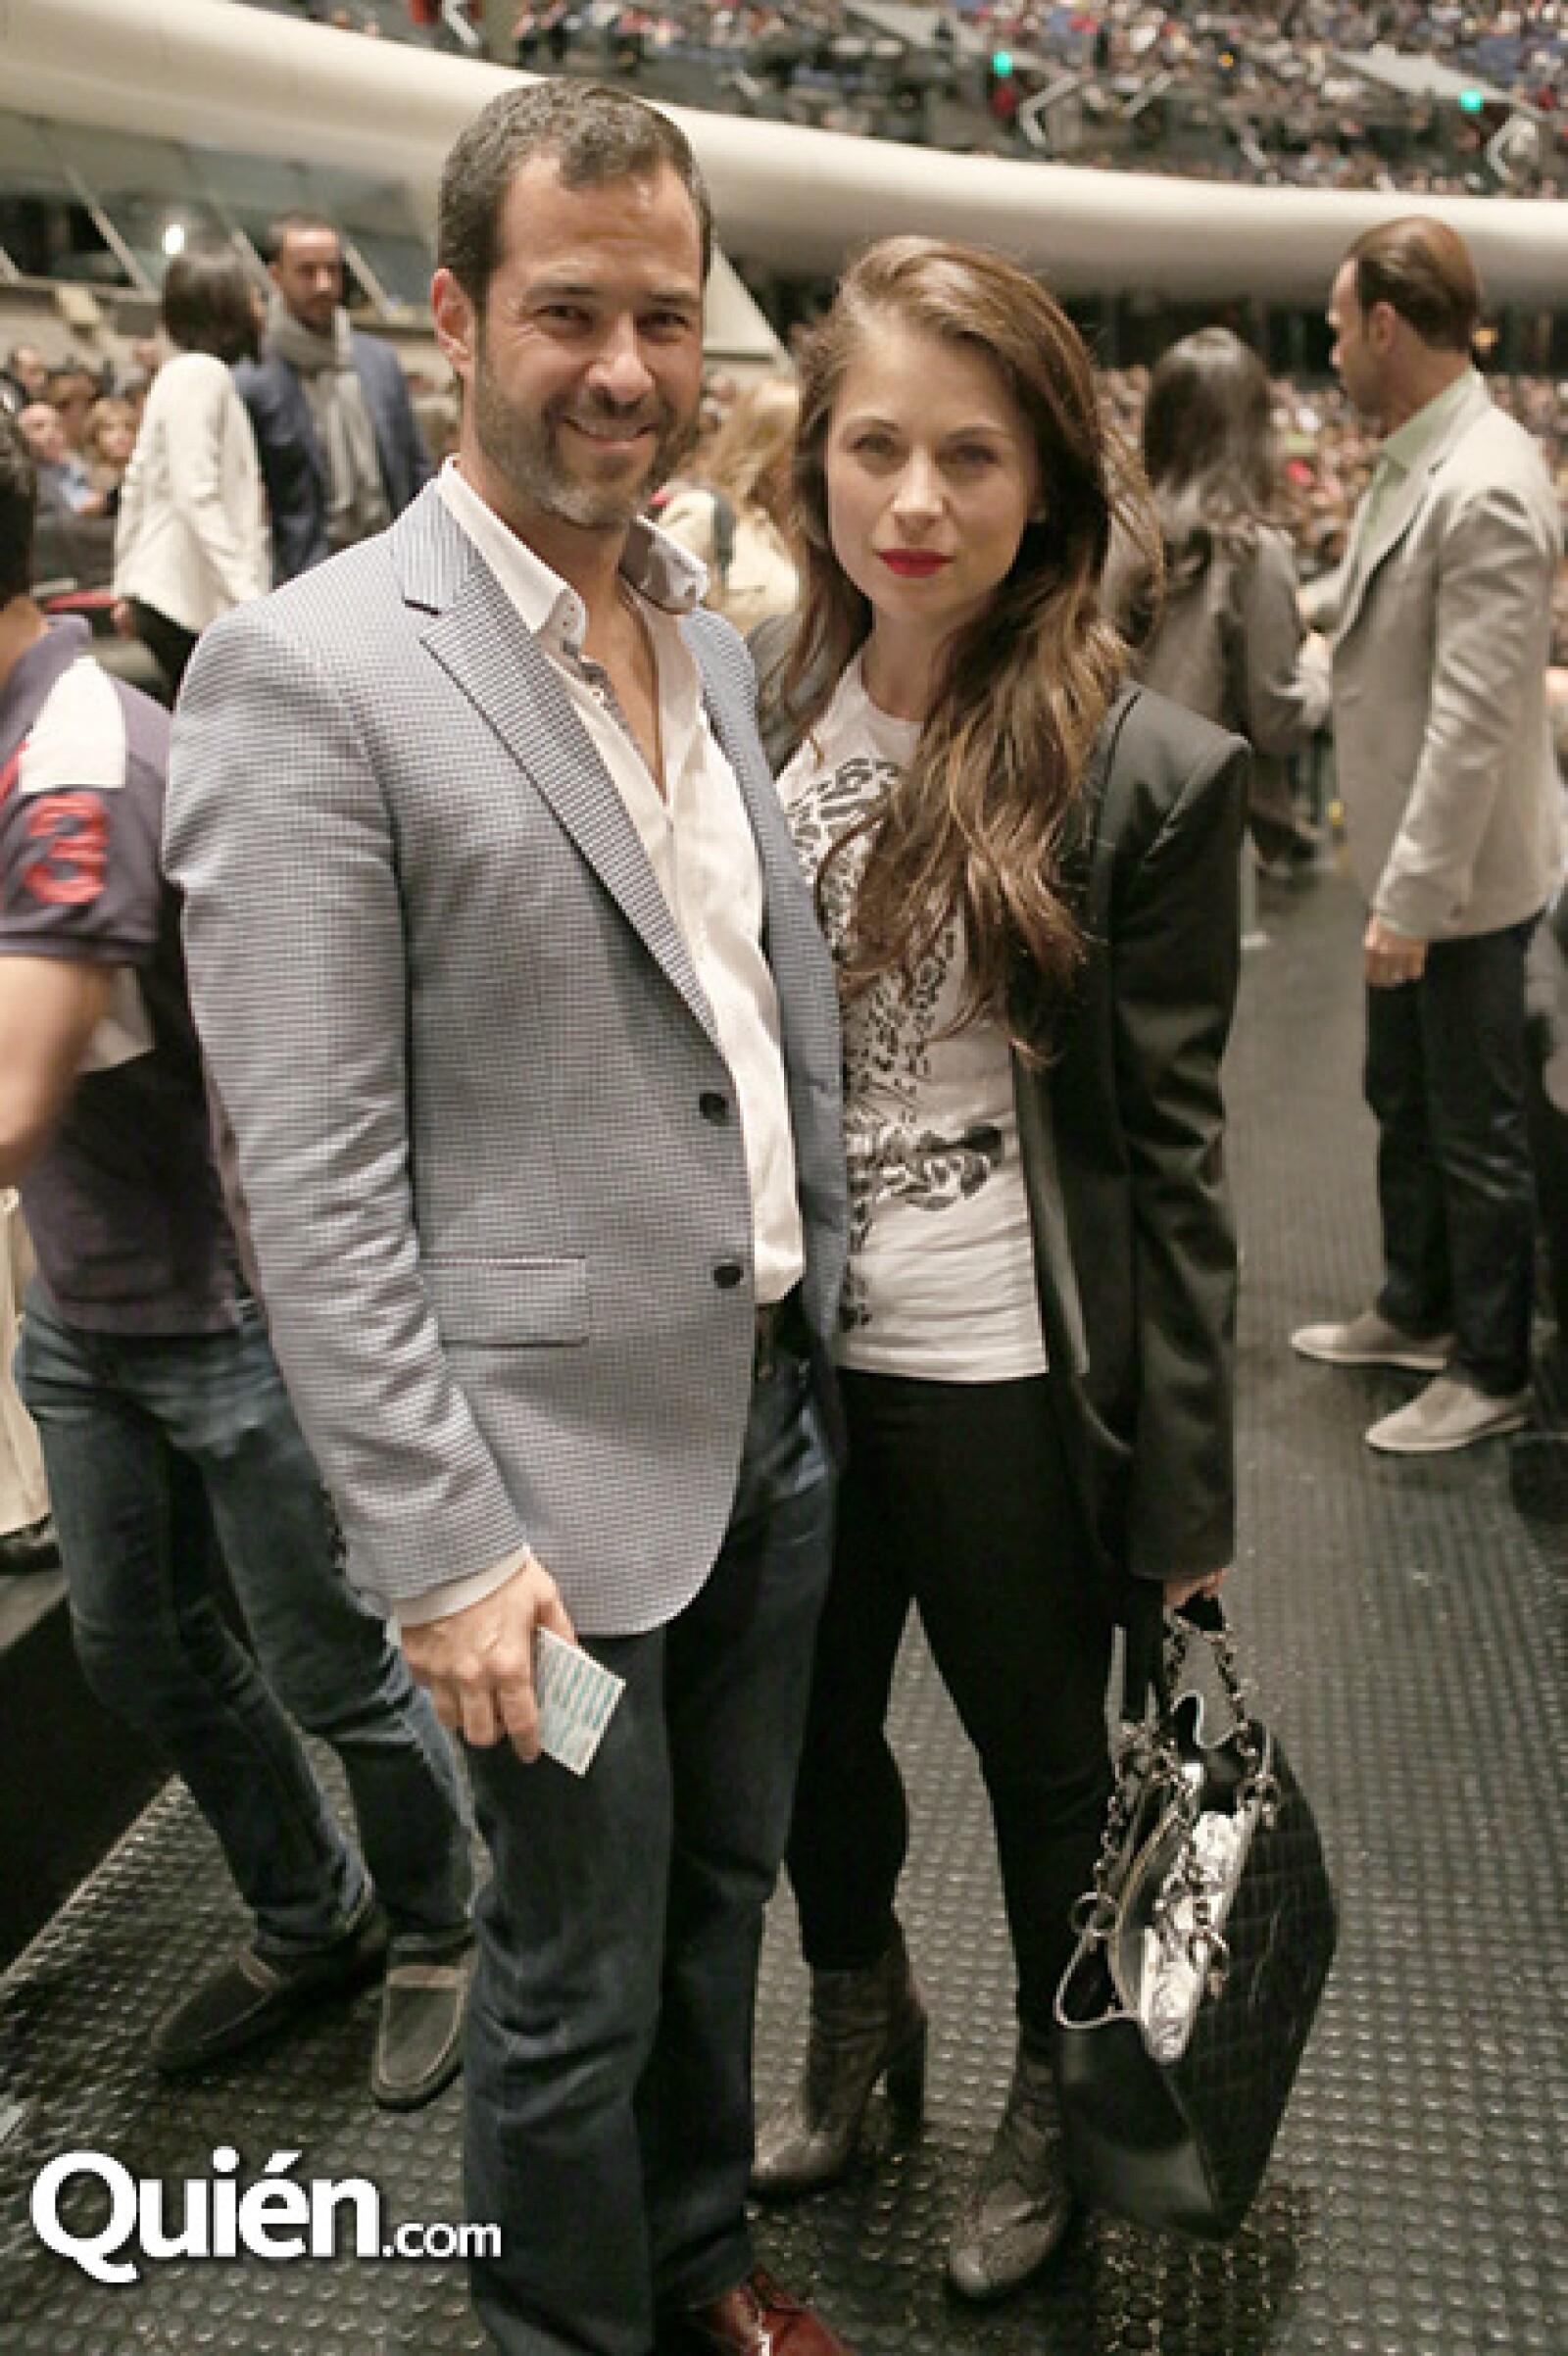 Emiliano Salinas y Ludwika Paleta